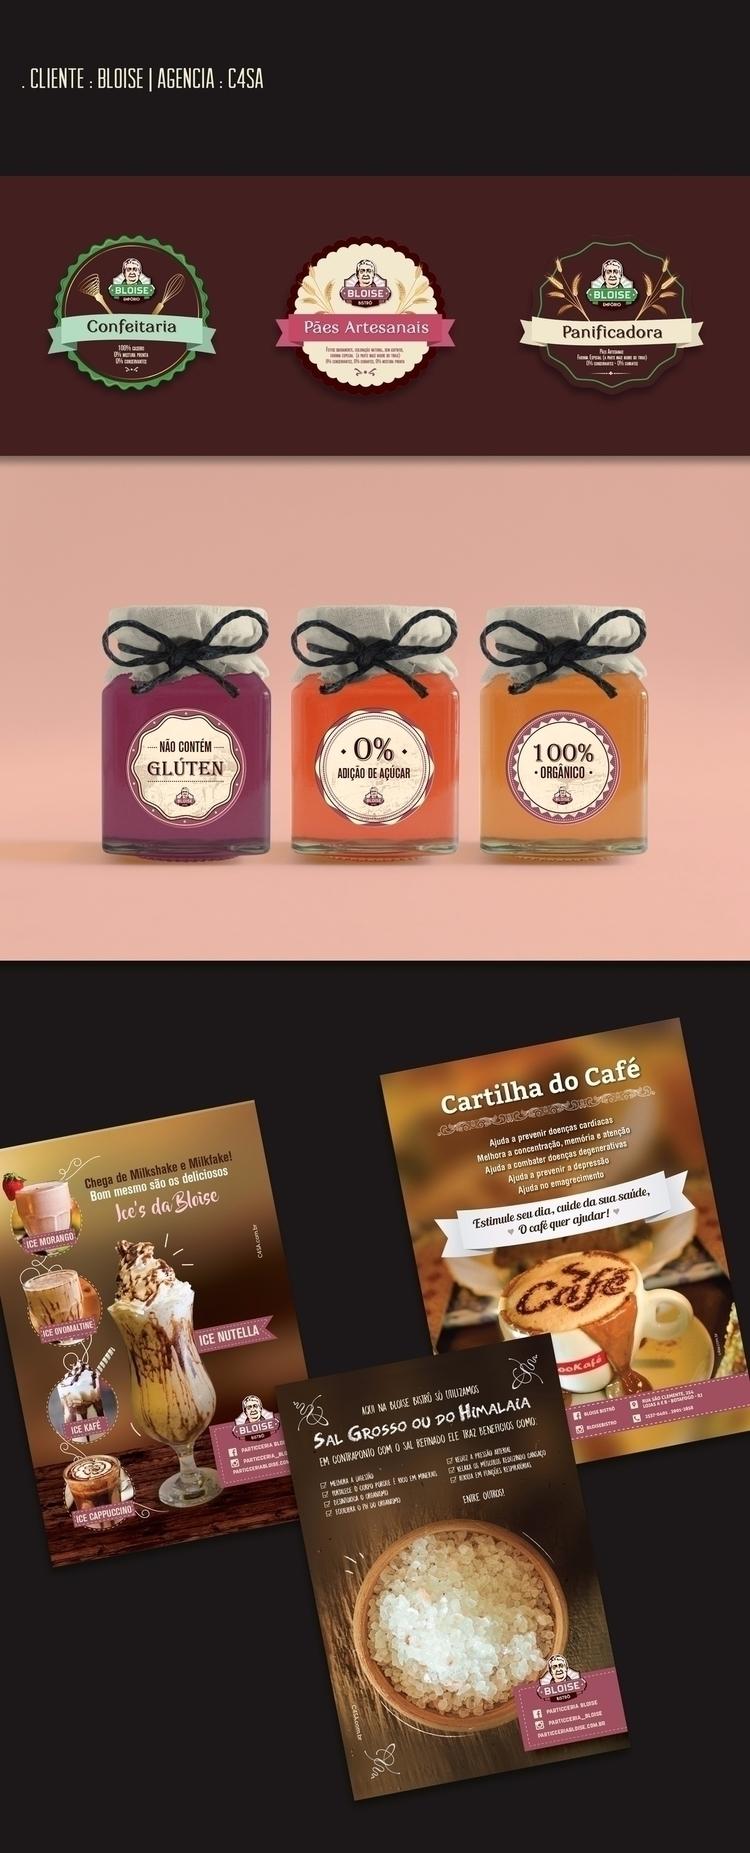 Stationary Bakery - Materias im - viithay | ello